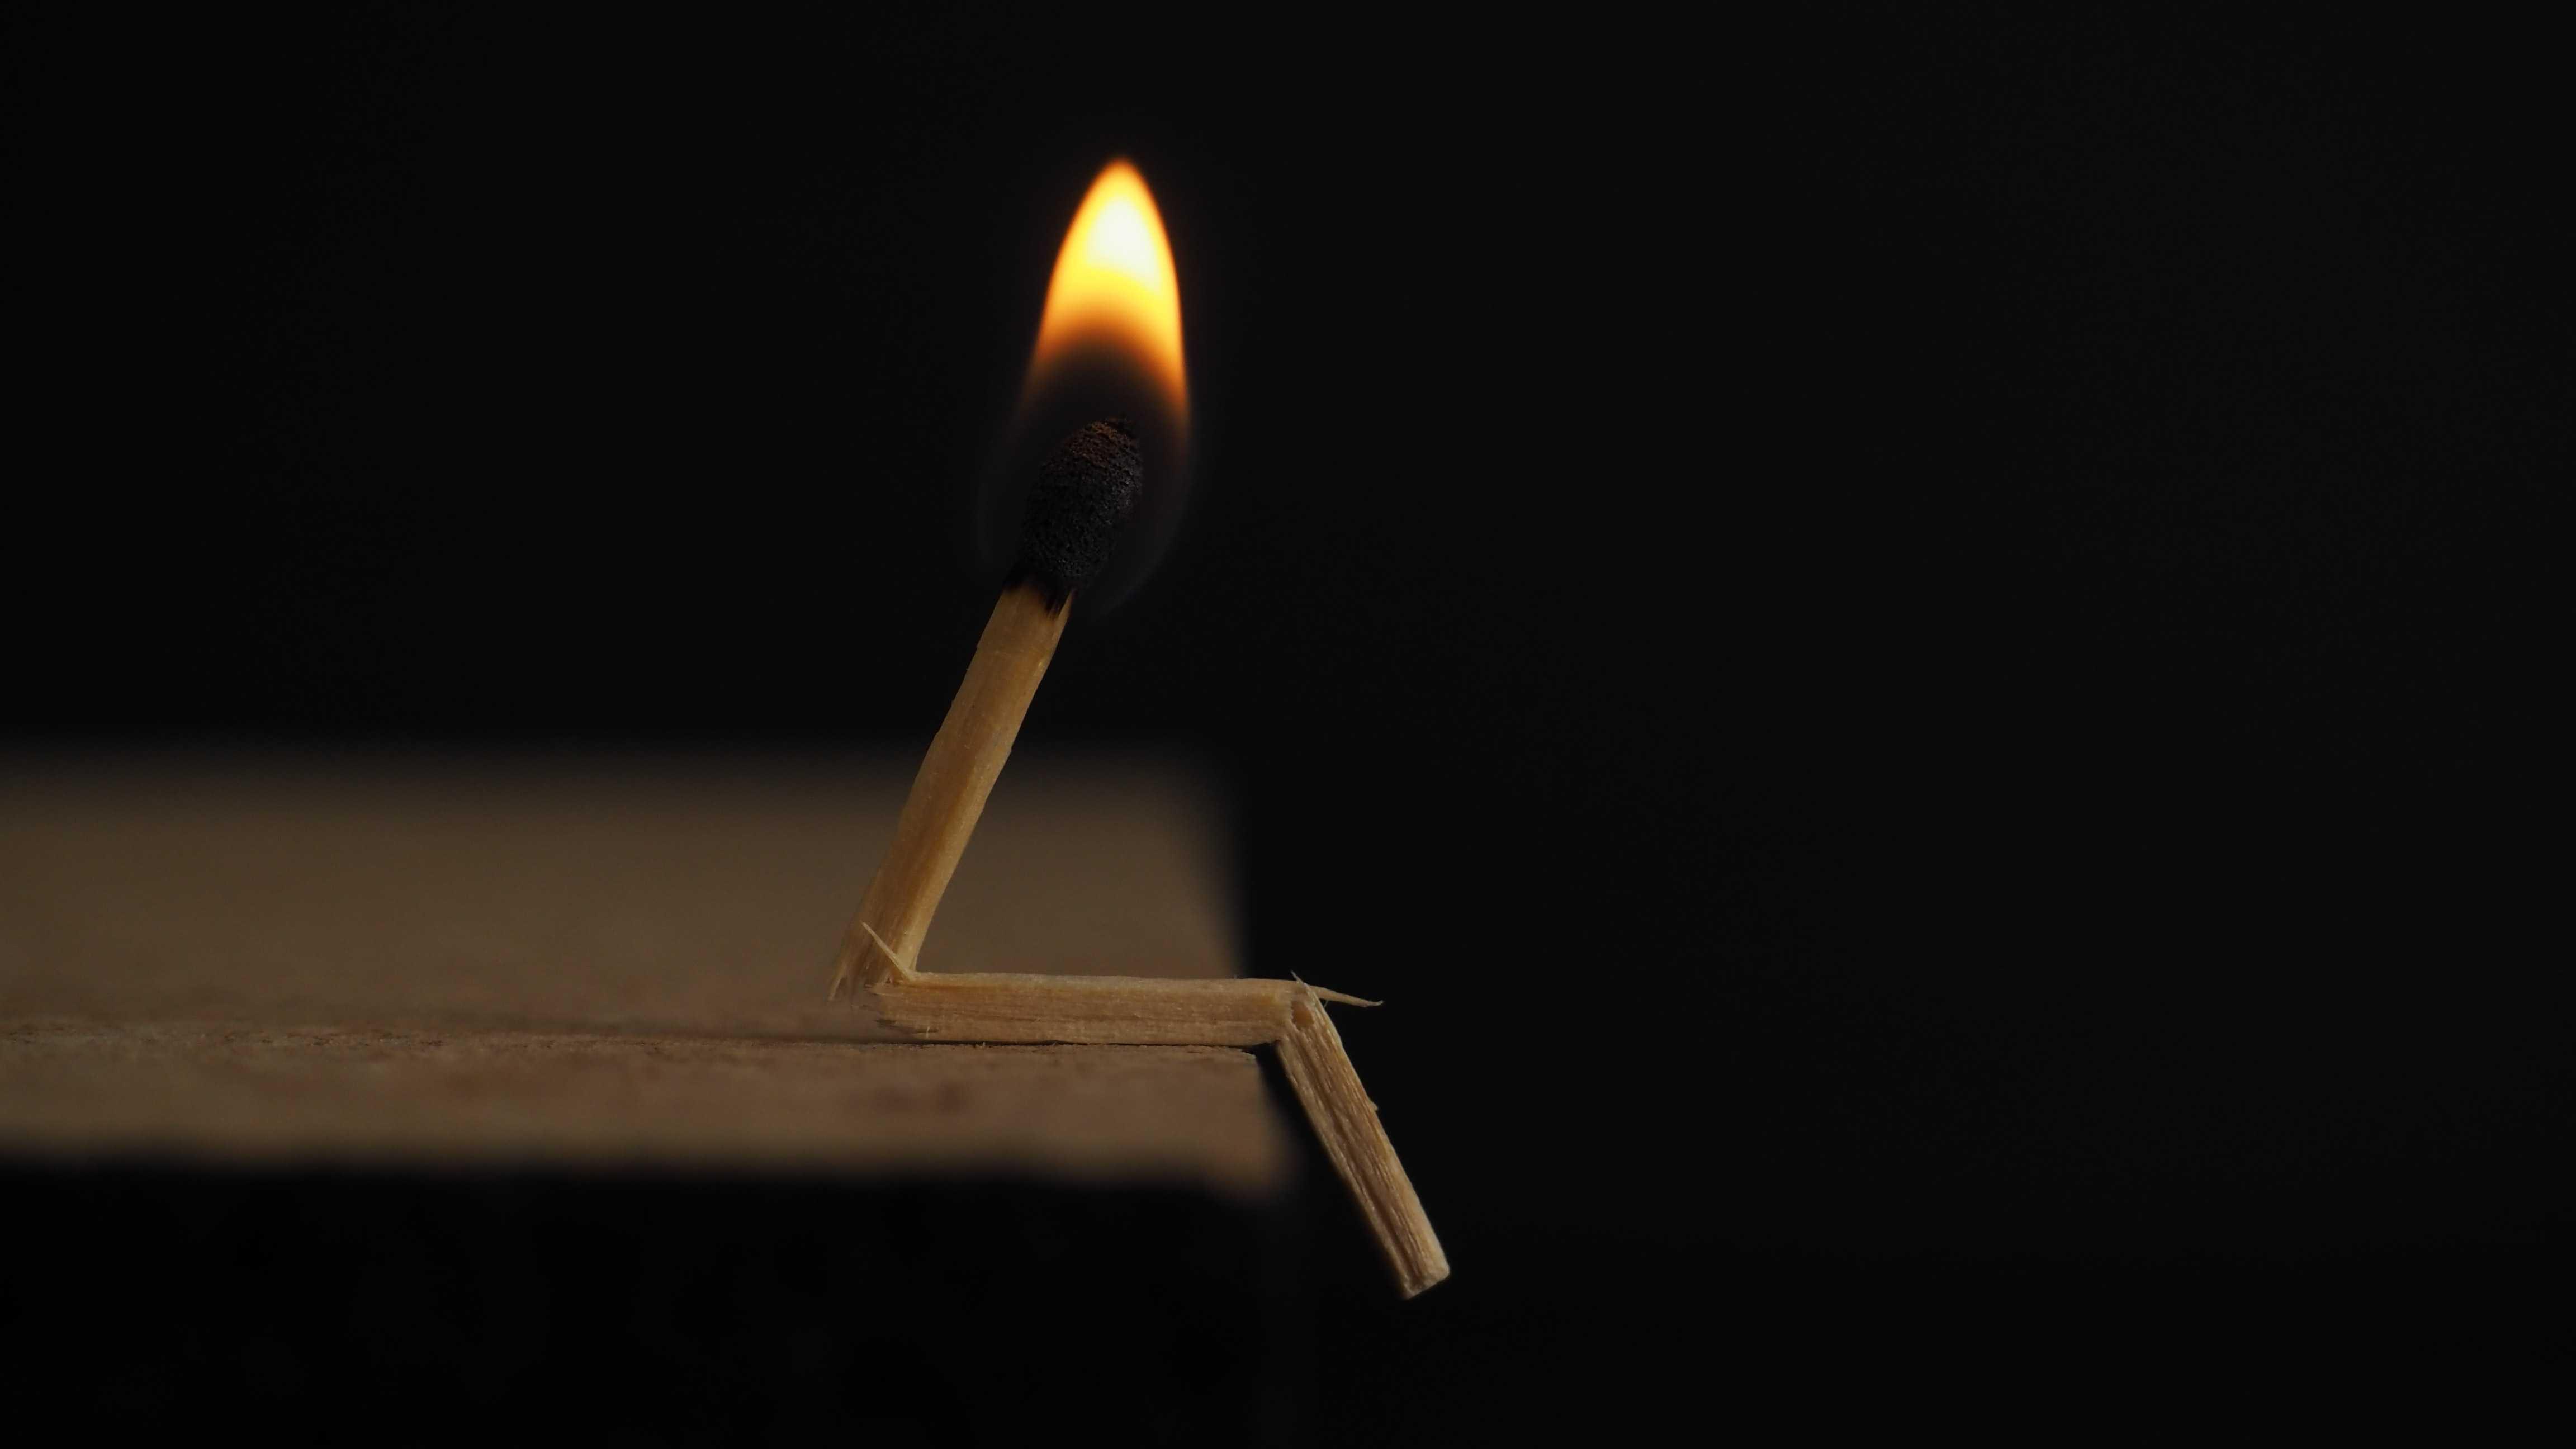 Blaze Blur by Sebastian Sorensen - foto: pexels.com